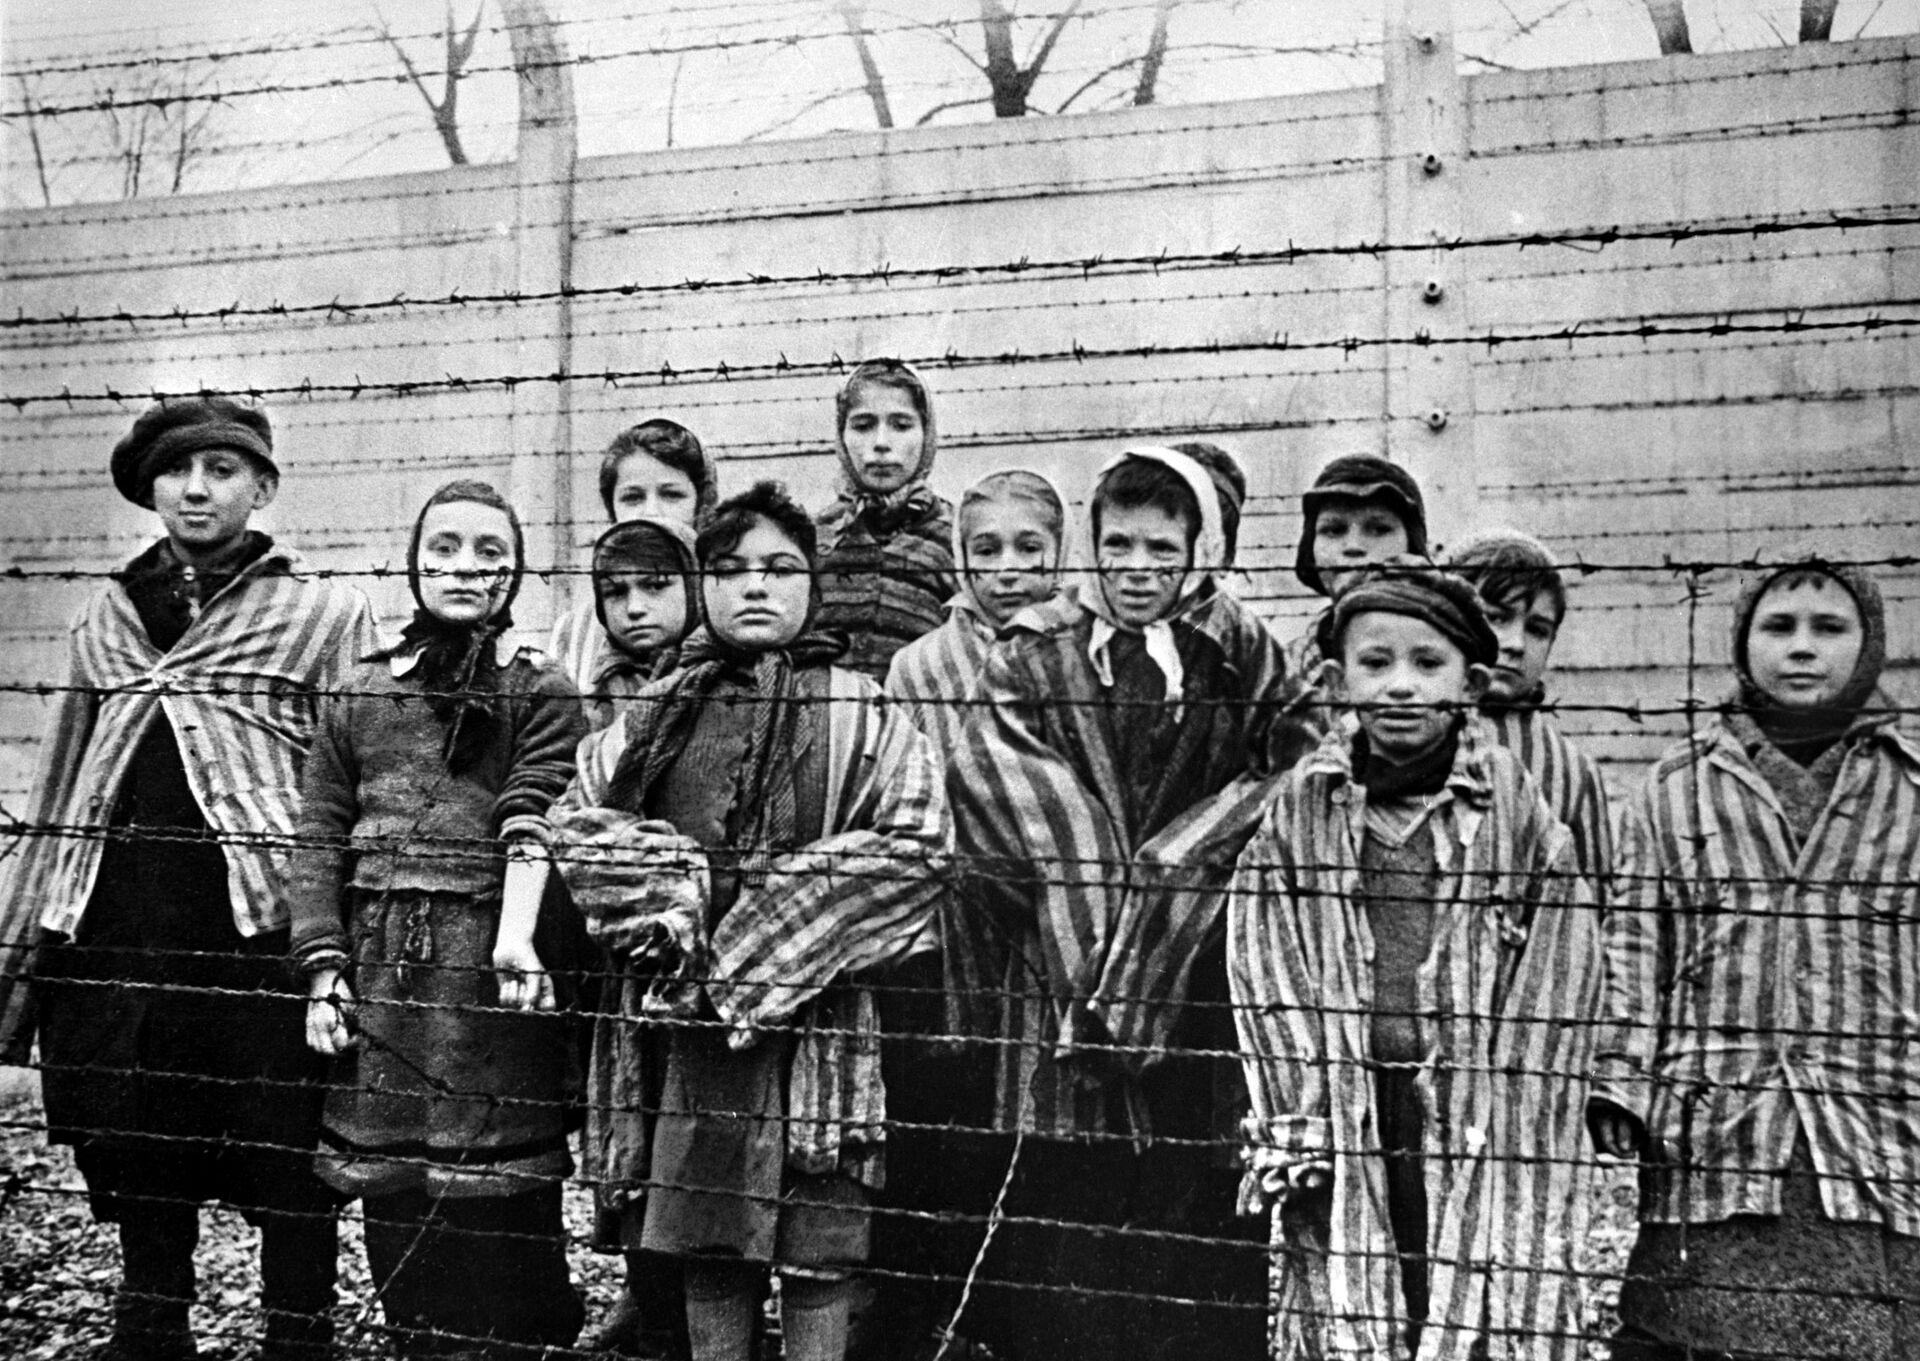 Trẻ em bị giam giữ tại trại tập trung Auschwitz, 1945 - Sputnik Việt Nam, 1920, 05.10.2021